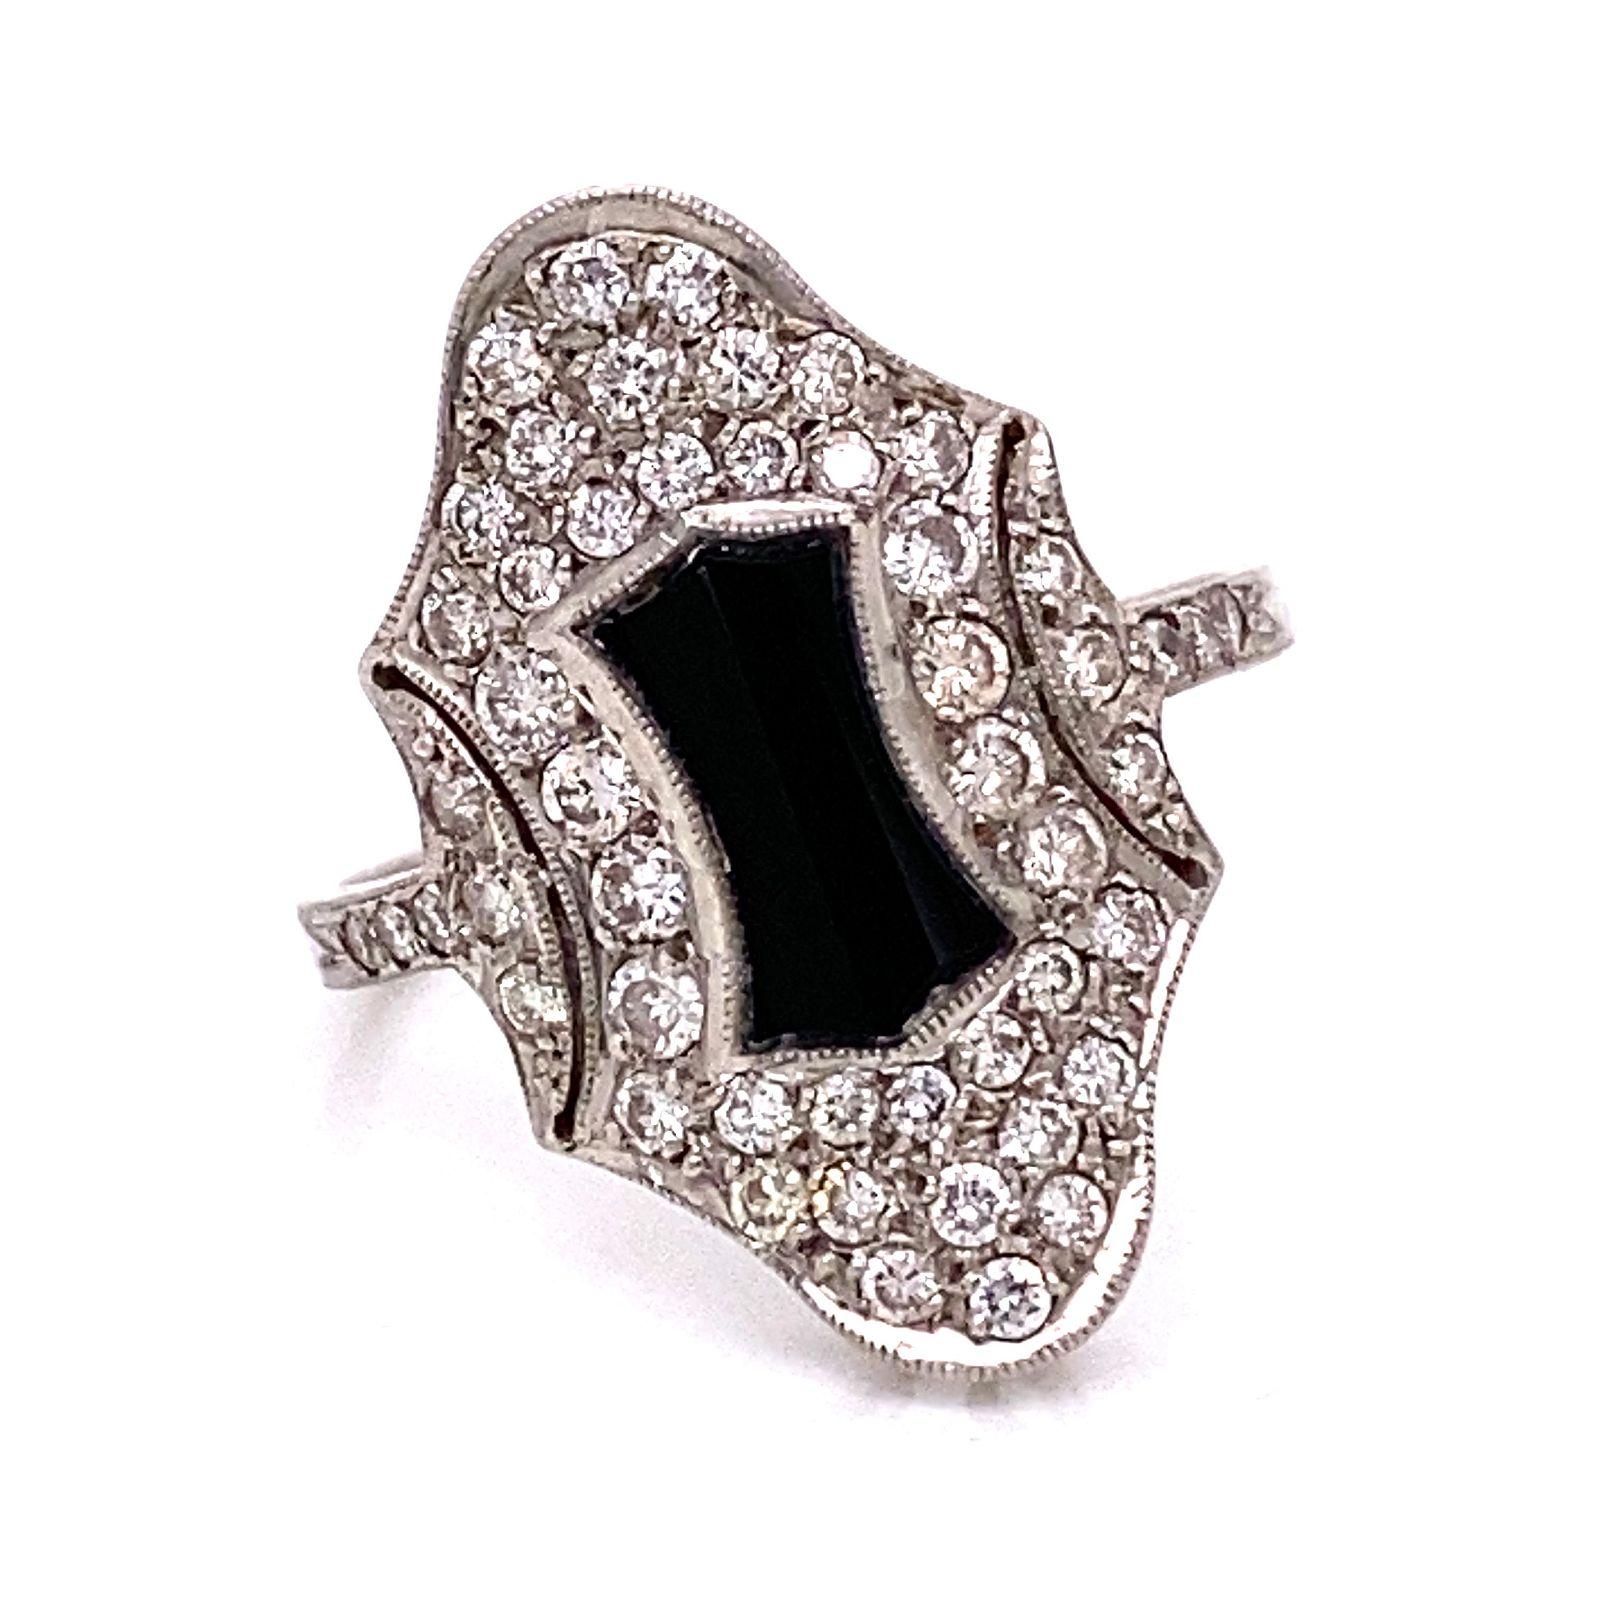 Ar Deco Platinum Onyx Diamond Cocktail Ring